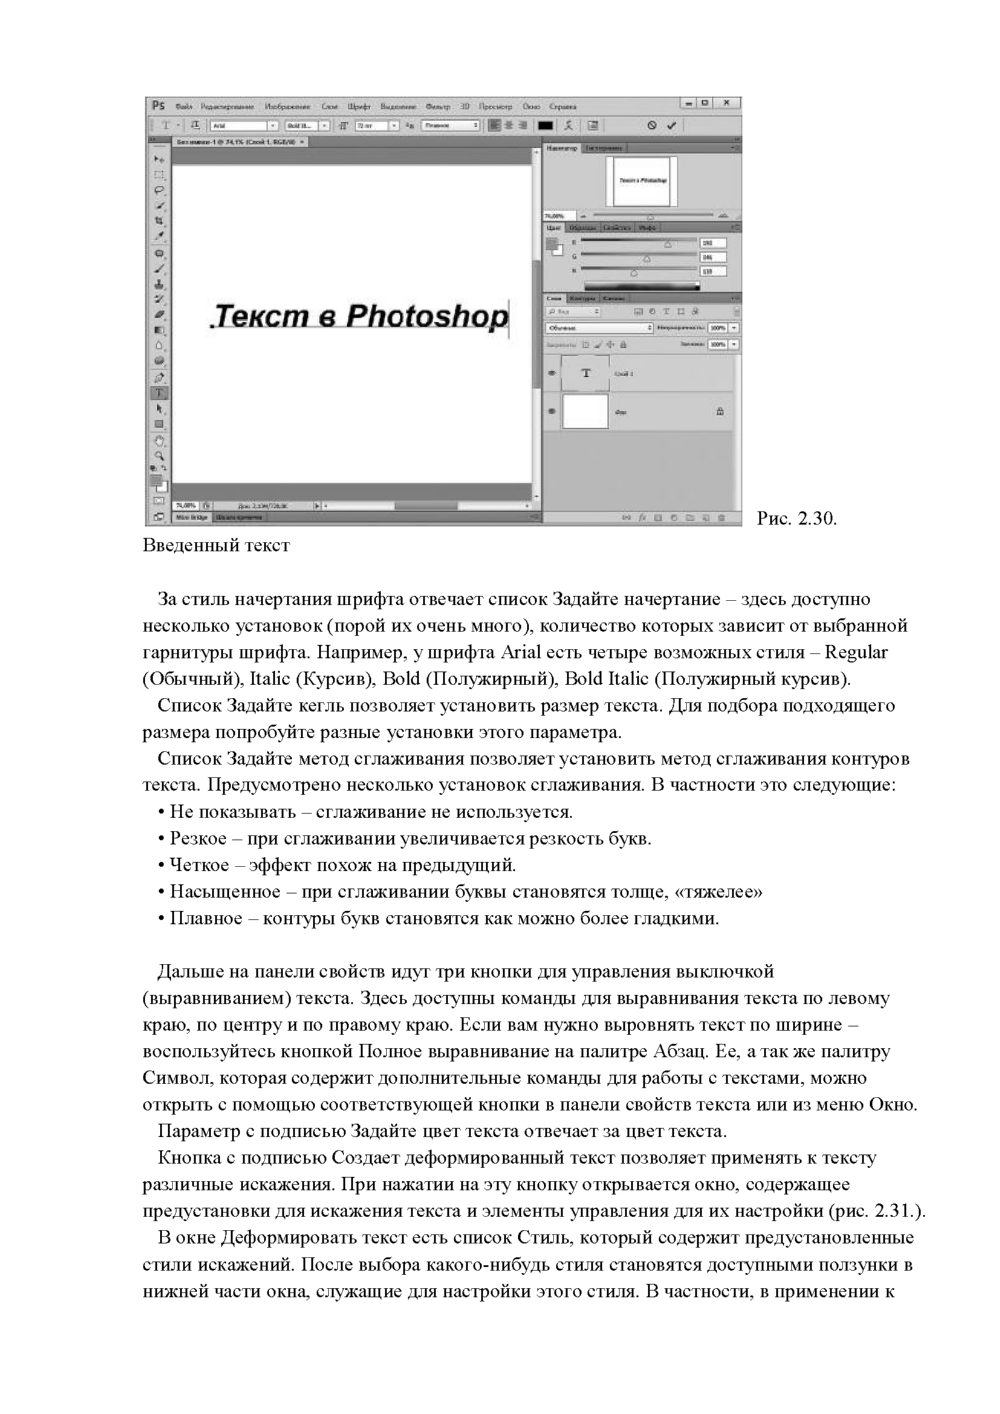 http://i5.imageban.ru/out/2013/11/28/edfef6e2d65bd3c7595b0d7419e4e932.jpg